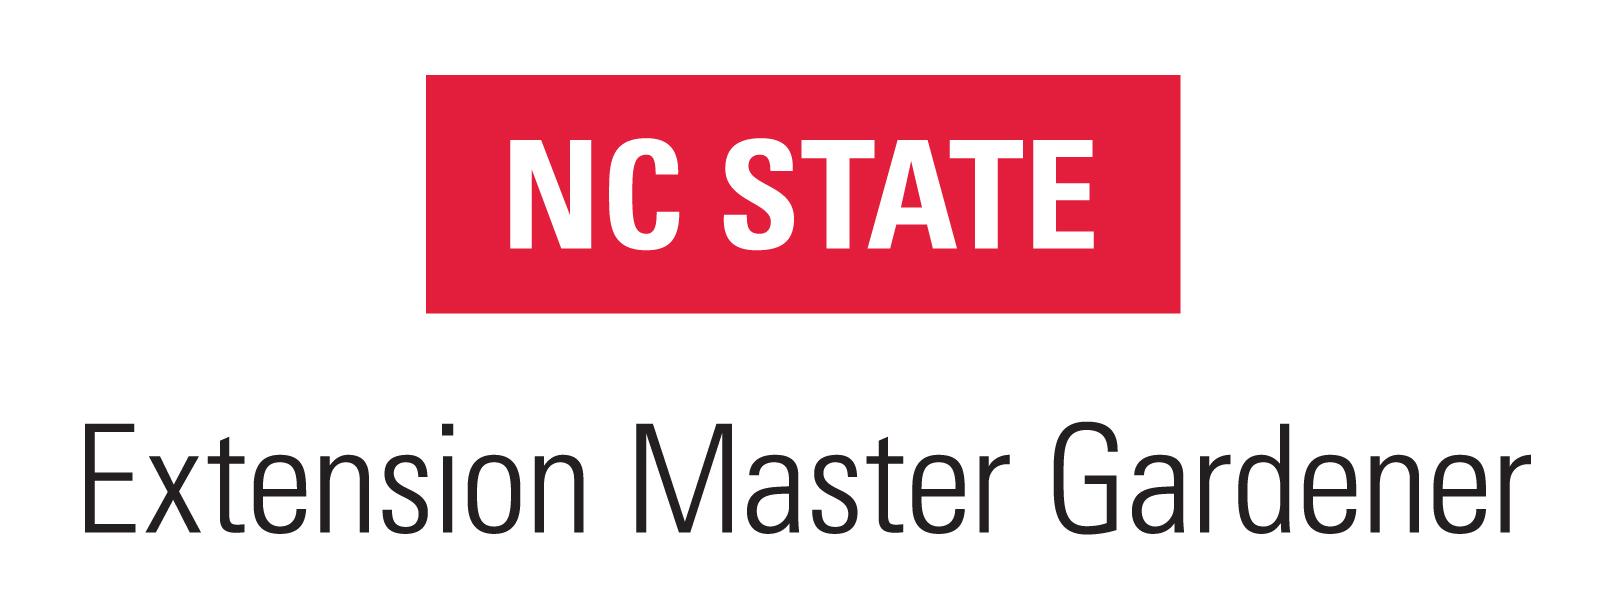 NC State Extension Master Gardener Logo_Stacked